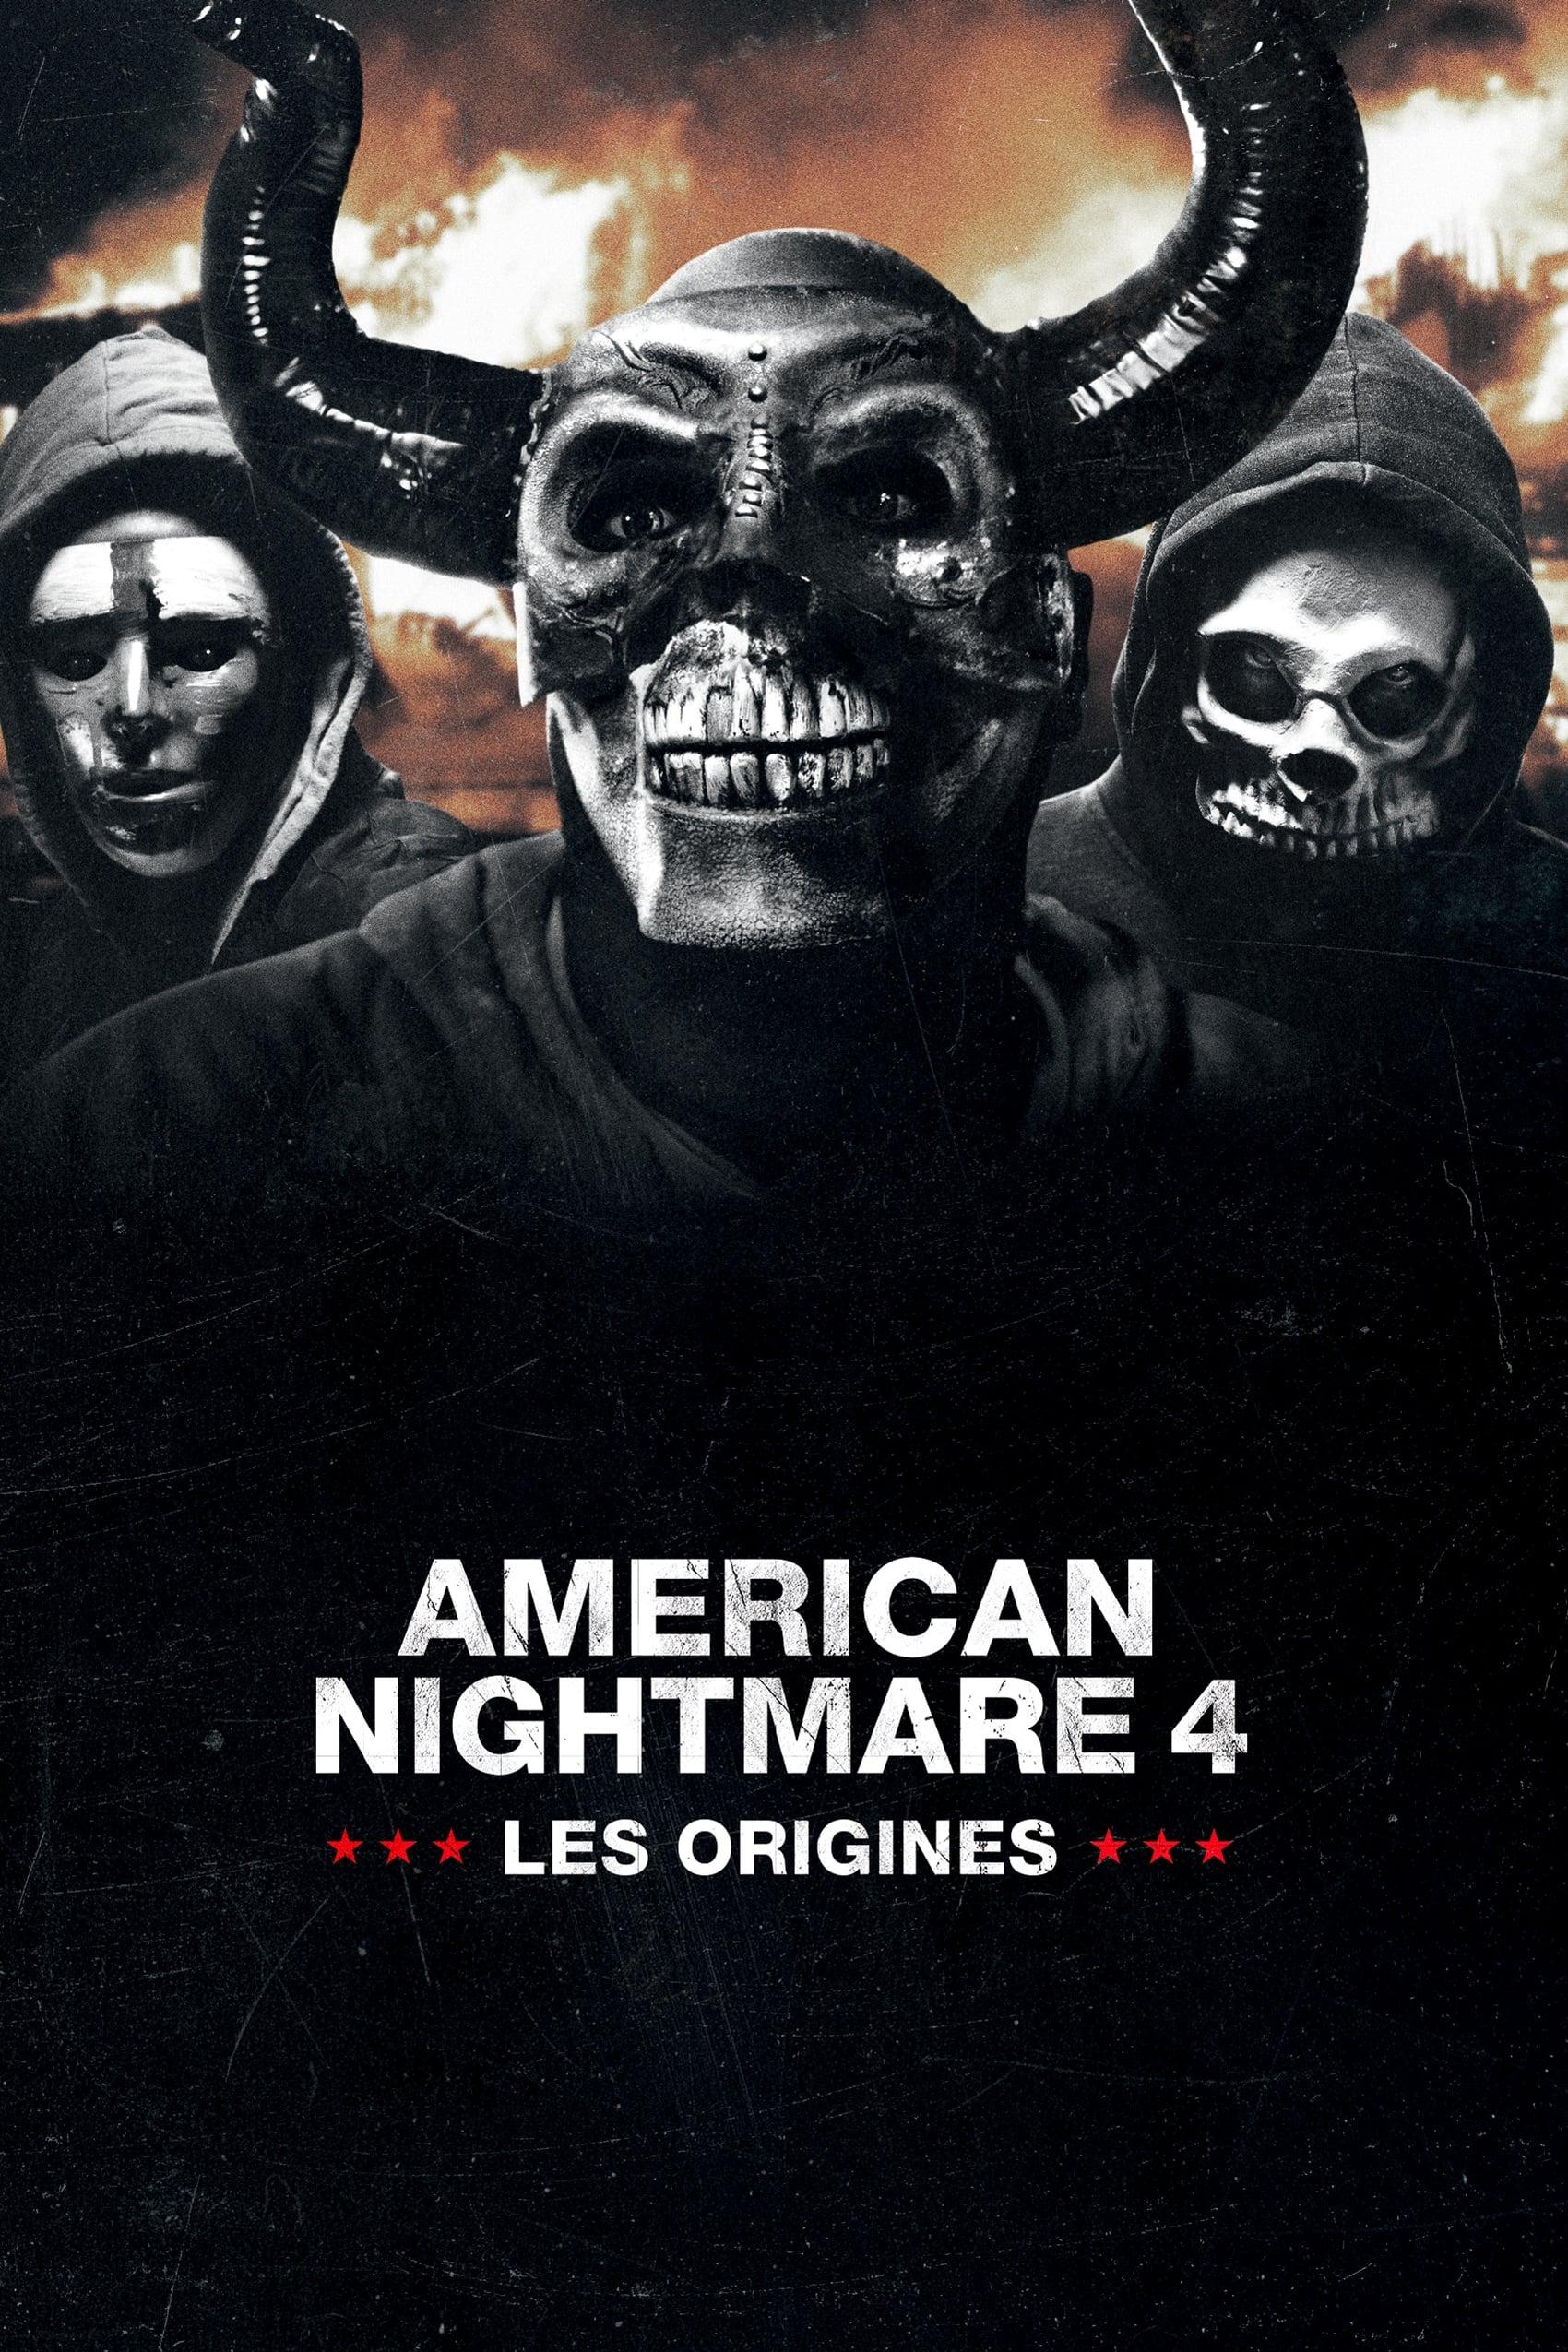 american nightmare 4 les origines 2018 streaming complet vf. Black Bedroom Furniture Sets. Home Design Ideas